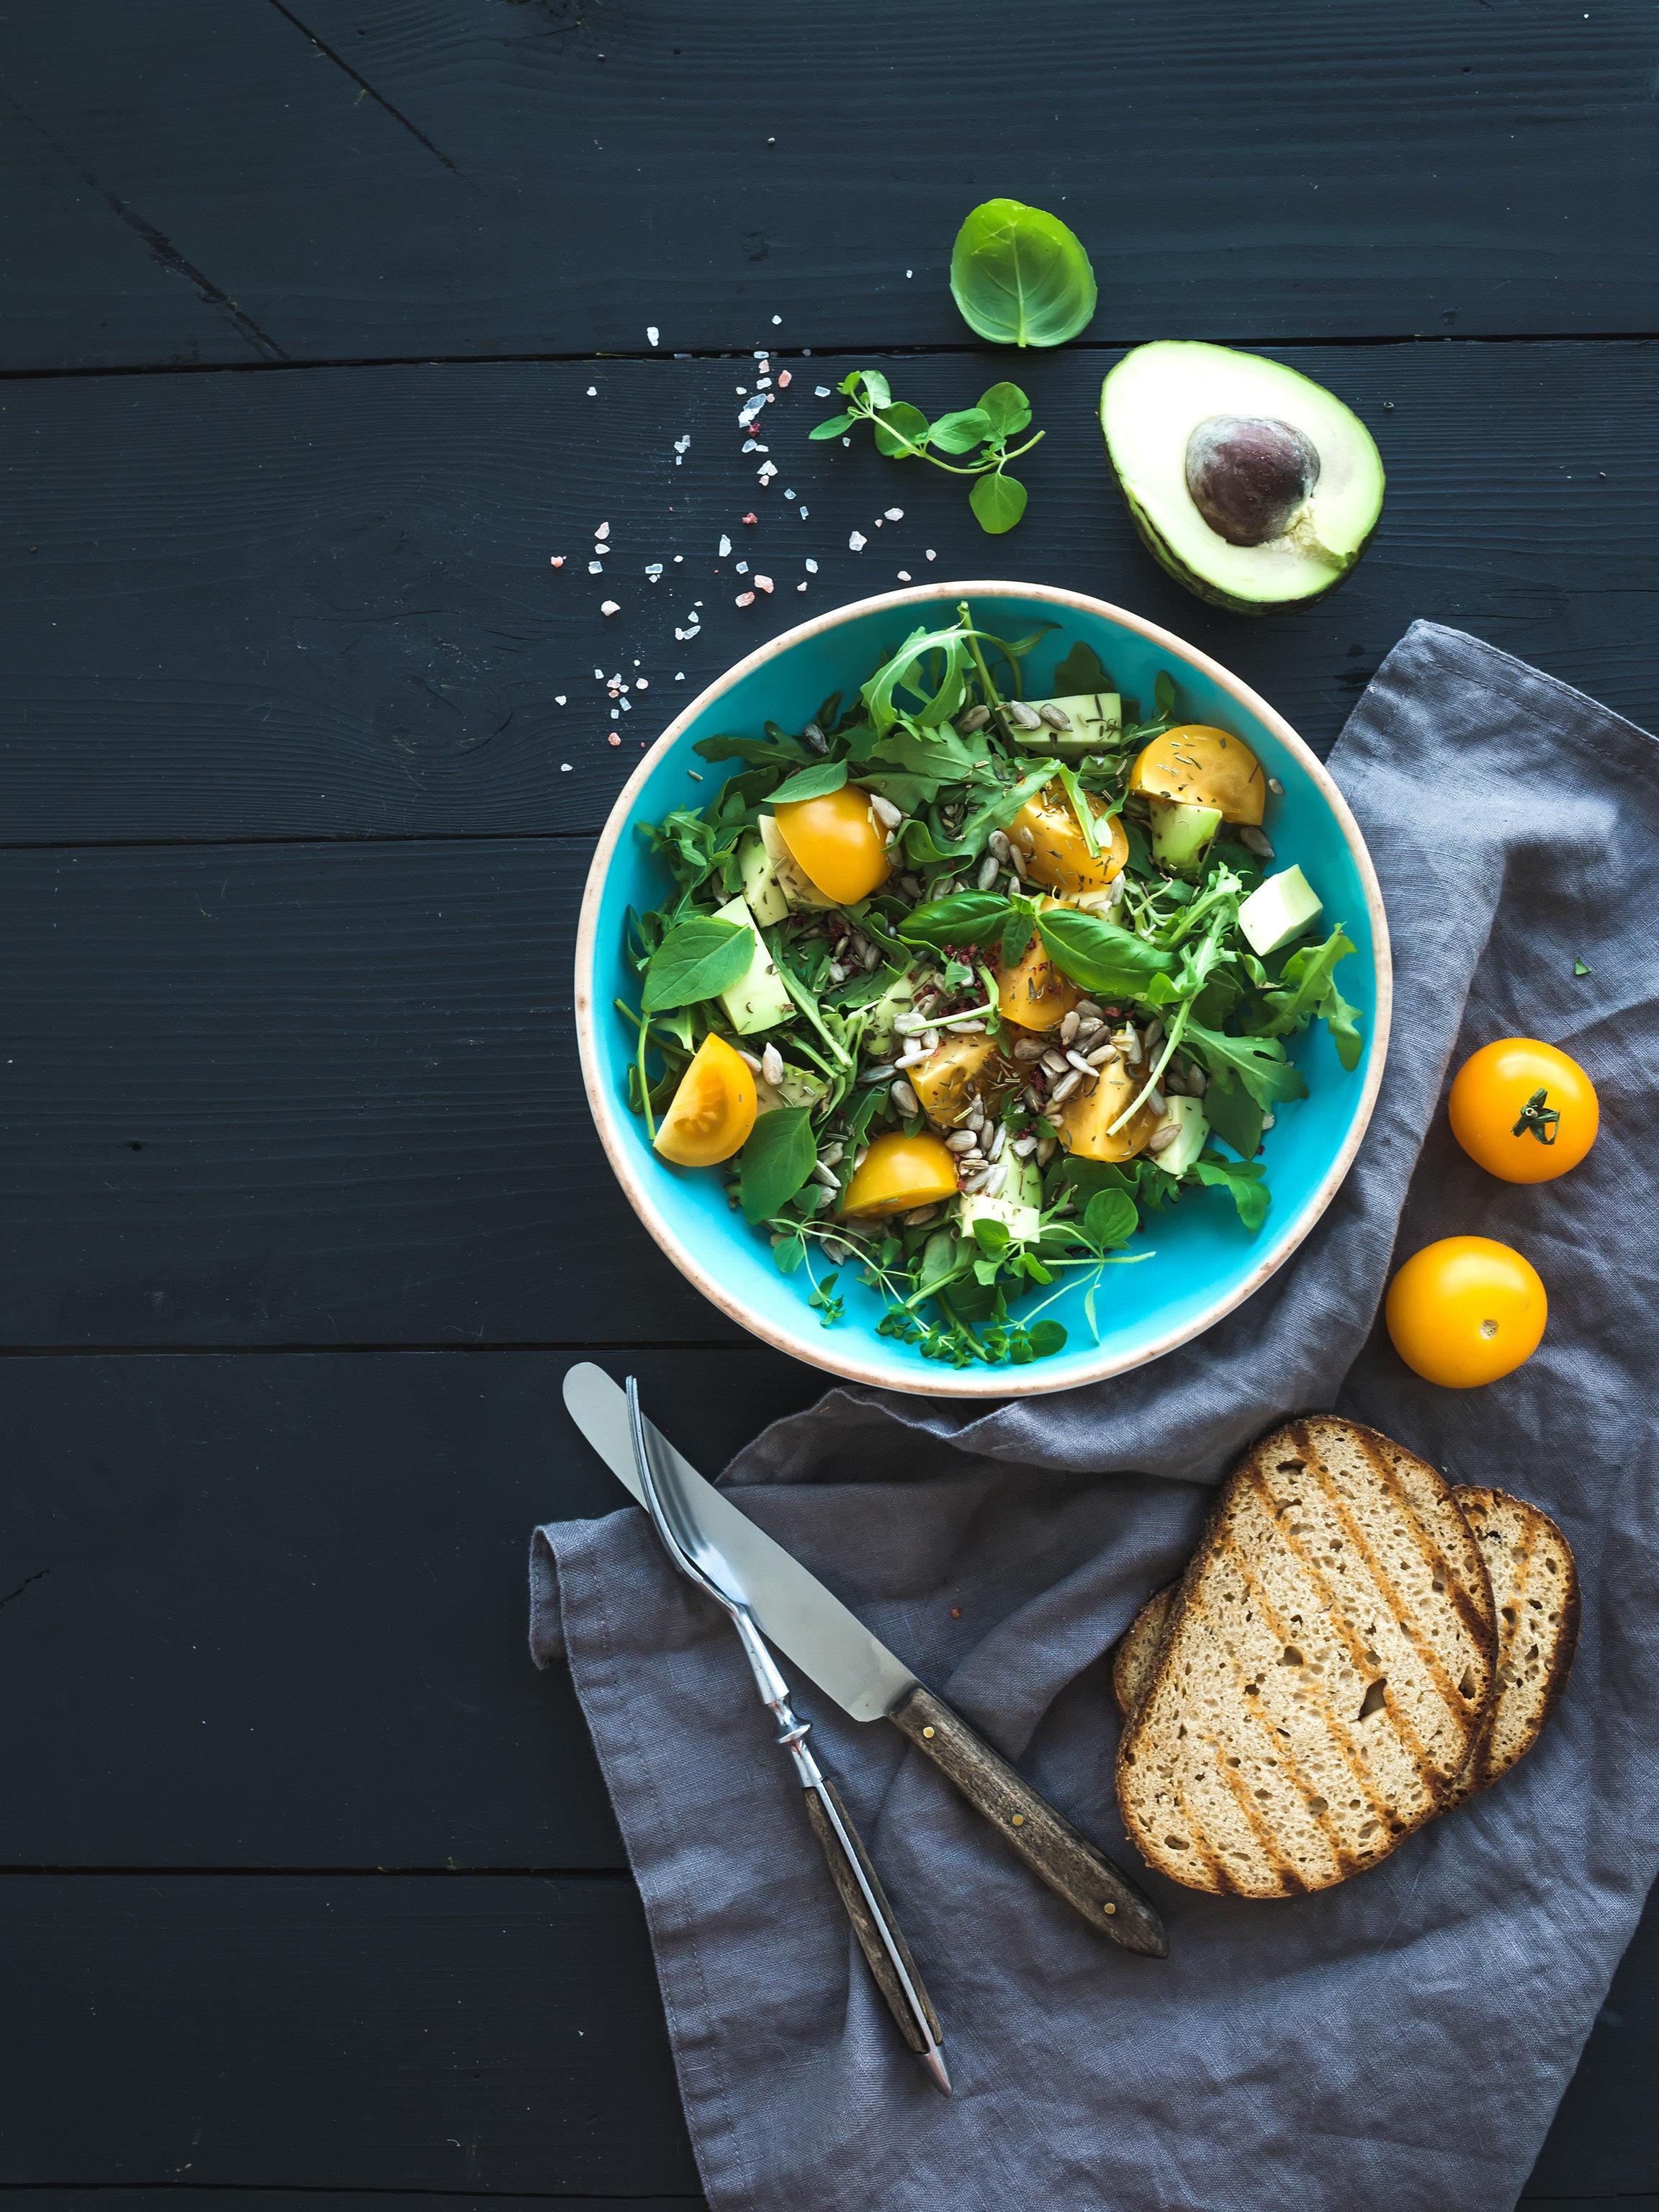 Food + Drink dish food produce land plant cuisine vegetable meal flowering plant